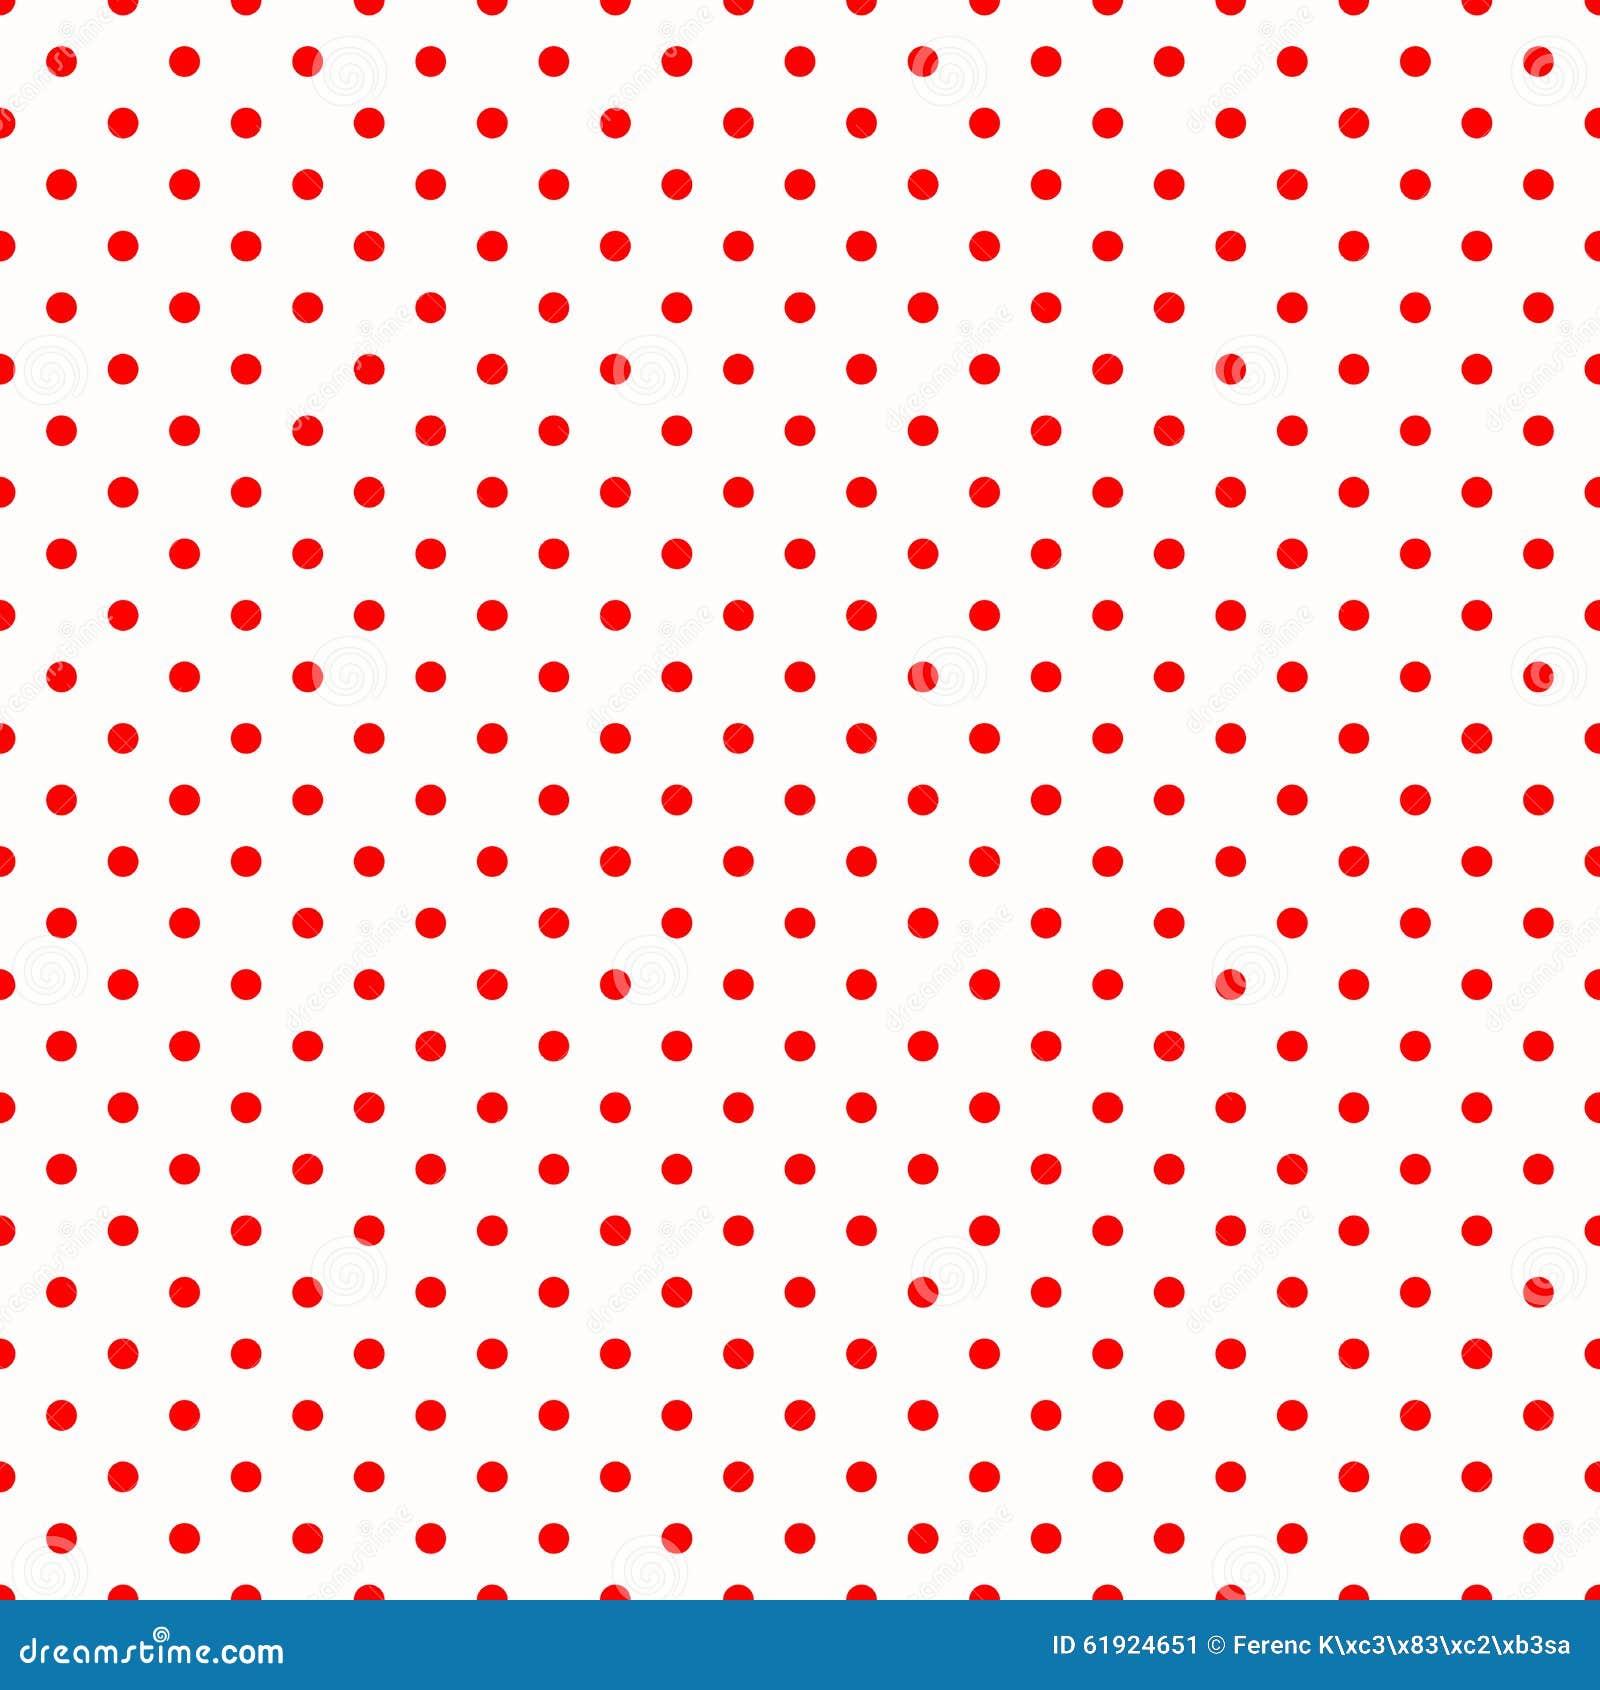 red white dots wallpaper - photo #20